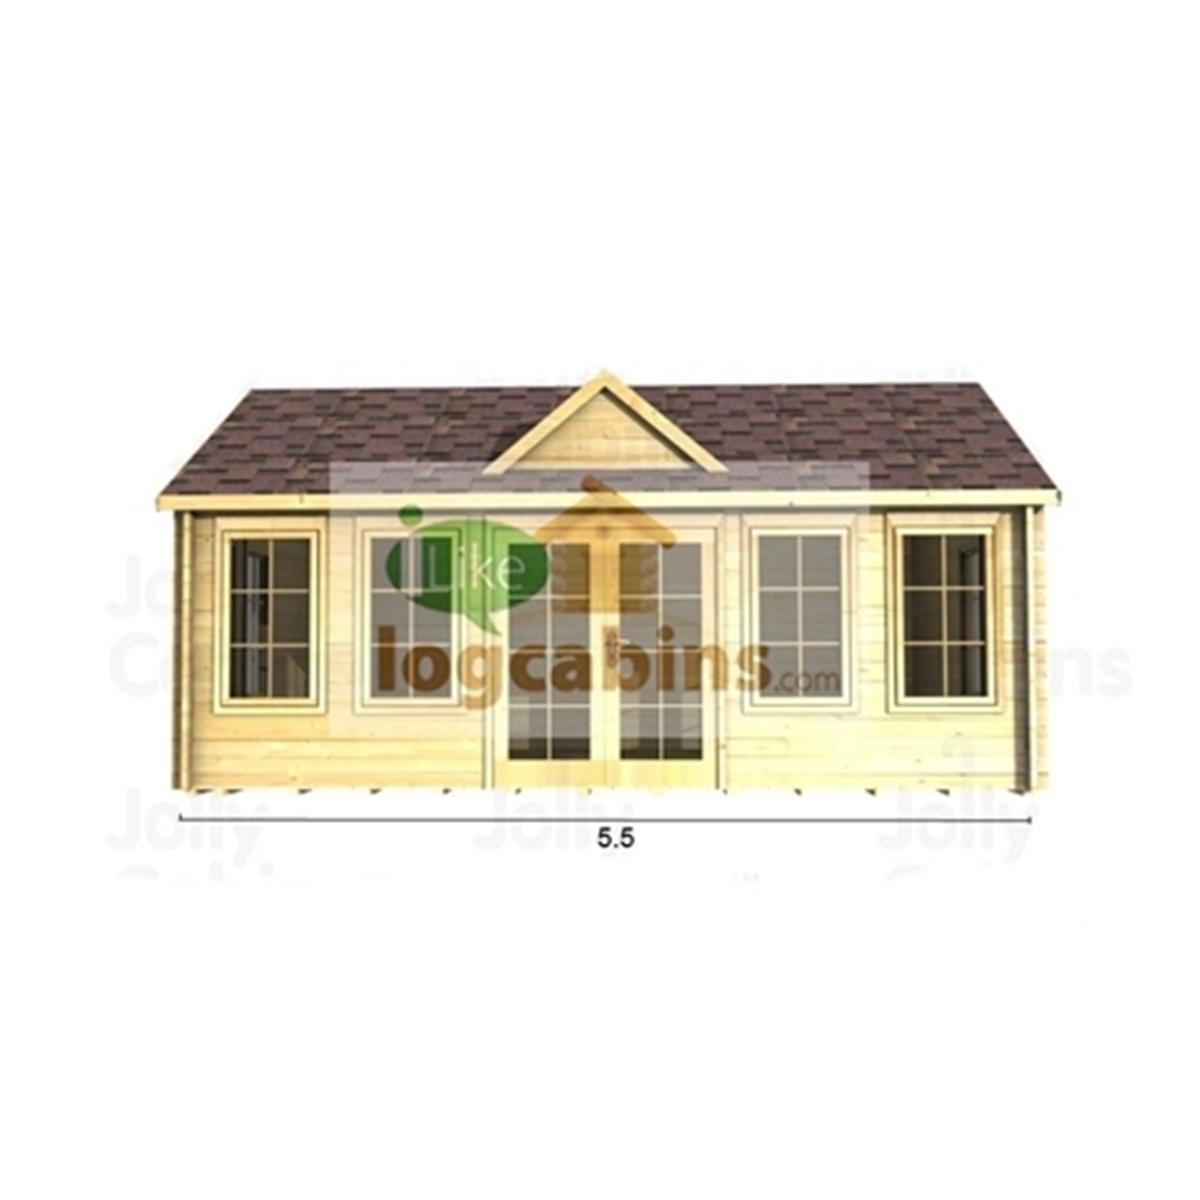 5.5m X 3.5m (18 X 12) Apex Reverse Log Cabin (2114